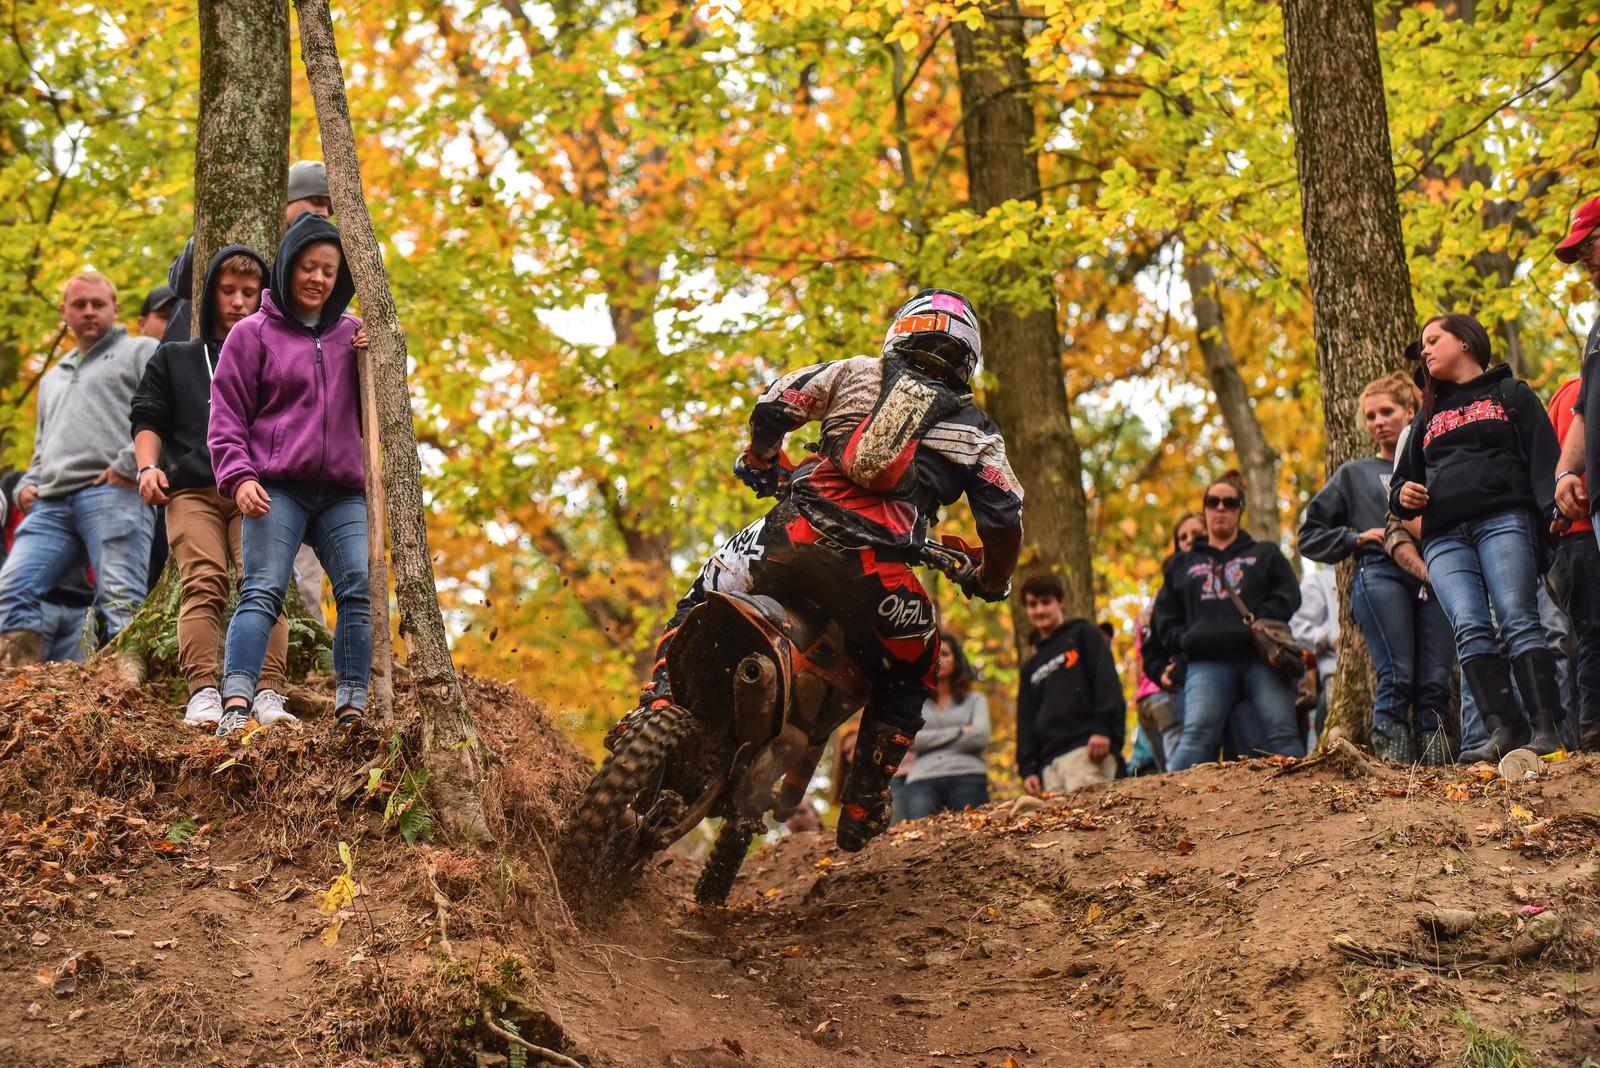 Steward Baylor - Ironman GNCC - Motocross Pictures - Vital MX